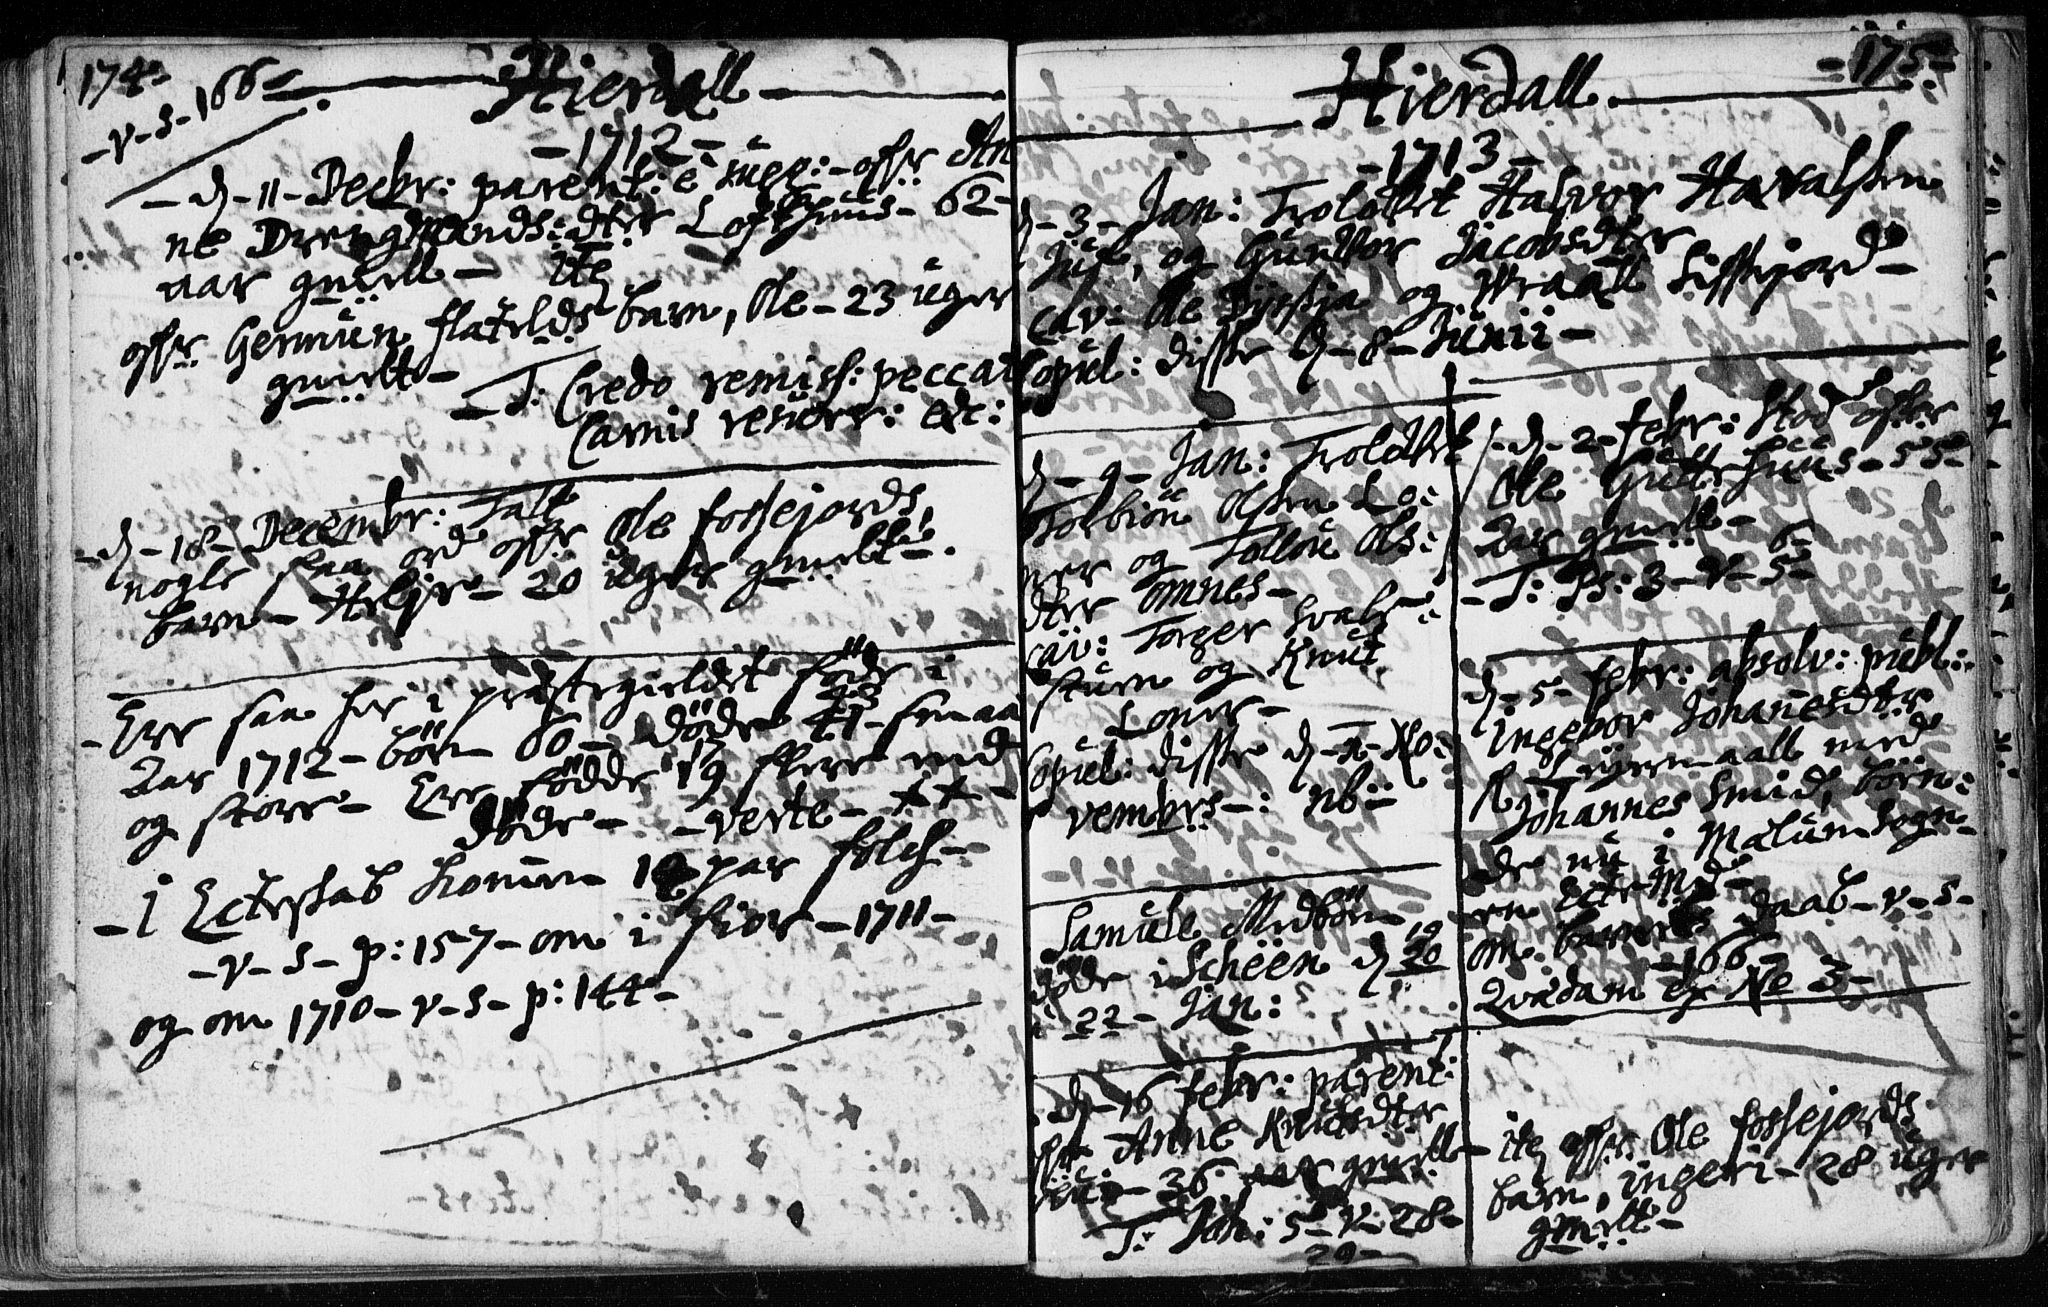 SAKO, Hjartdal kirkebøker, F/Fa/L0001: Ministerialbok nr. I 1, 1685-1714, s. 174-175